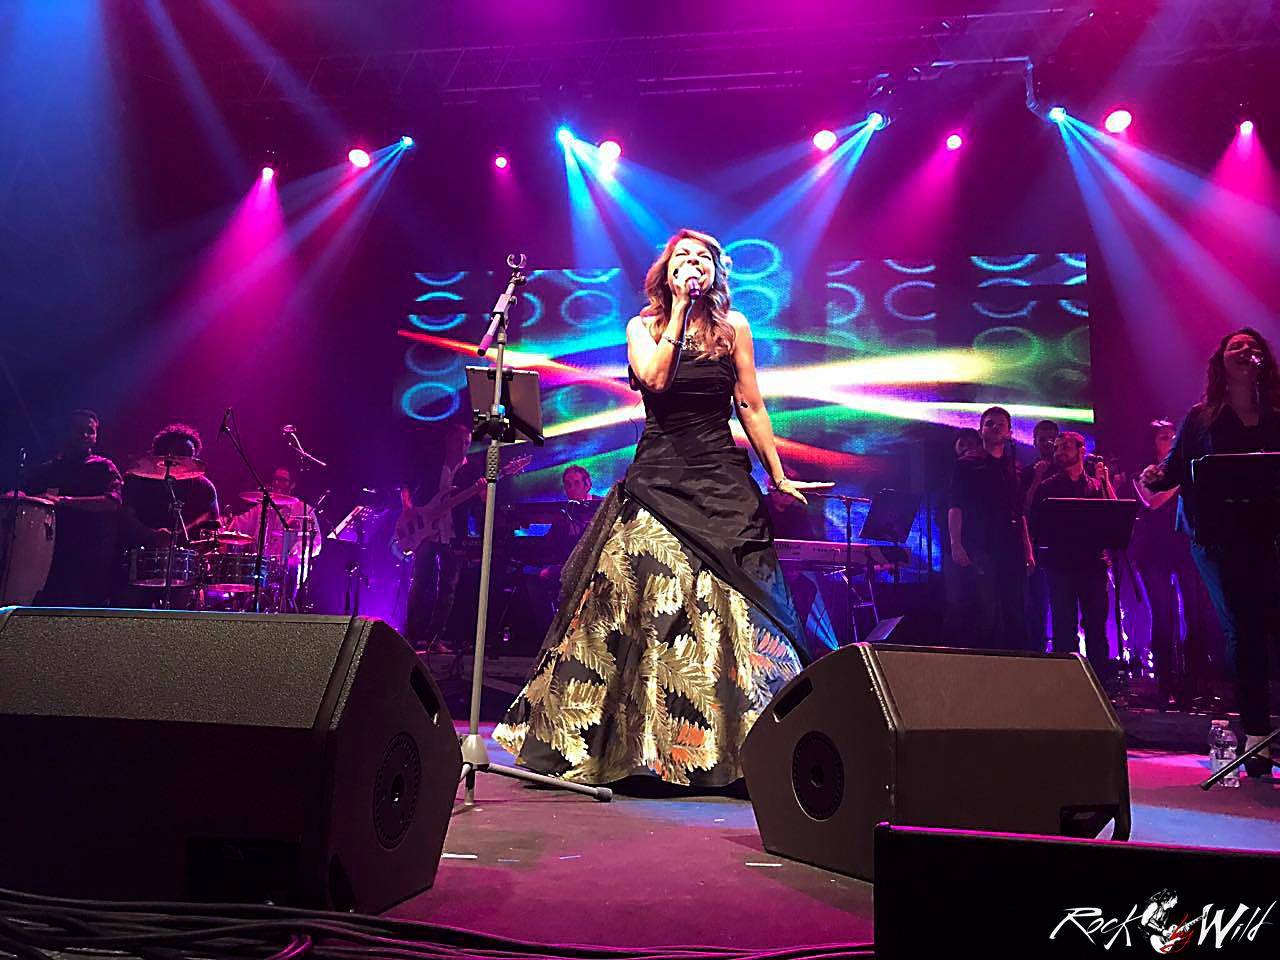 Cristina D'avena @ Atlantico - 28 01 2017